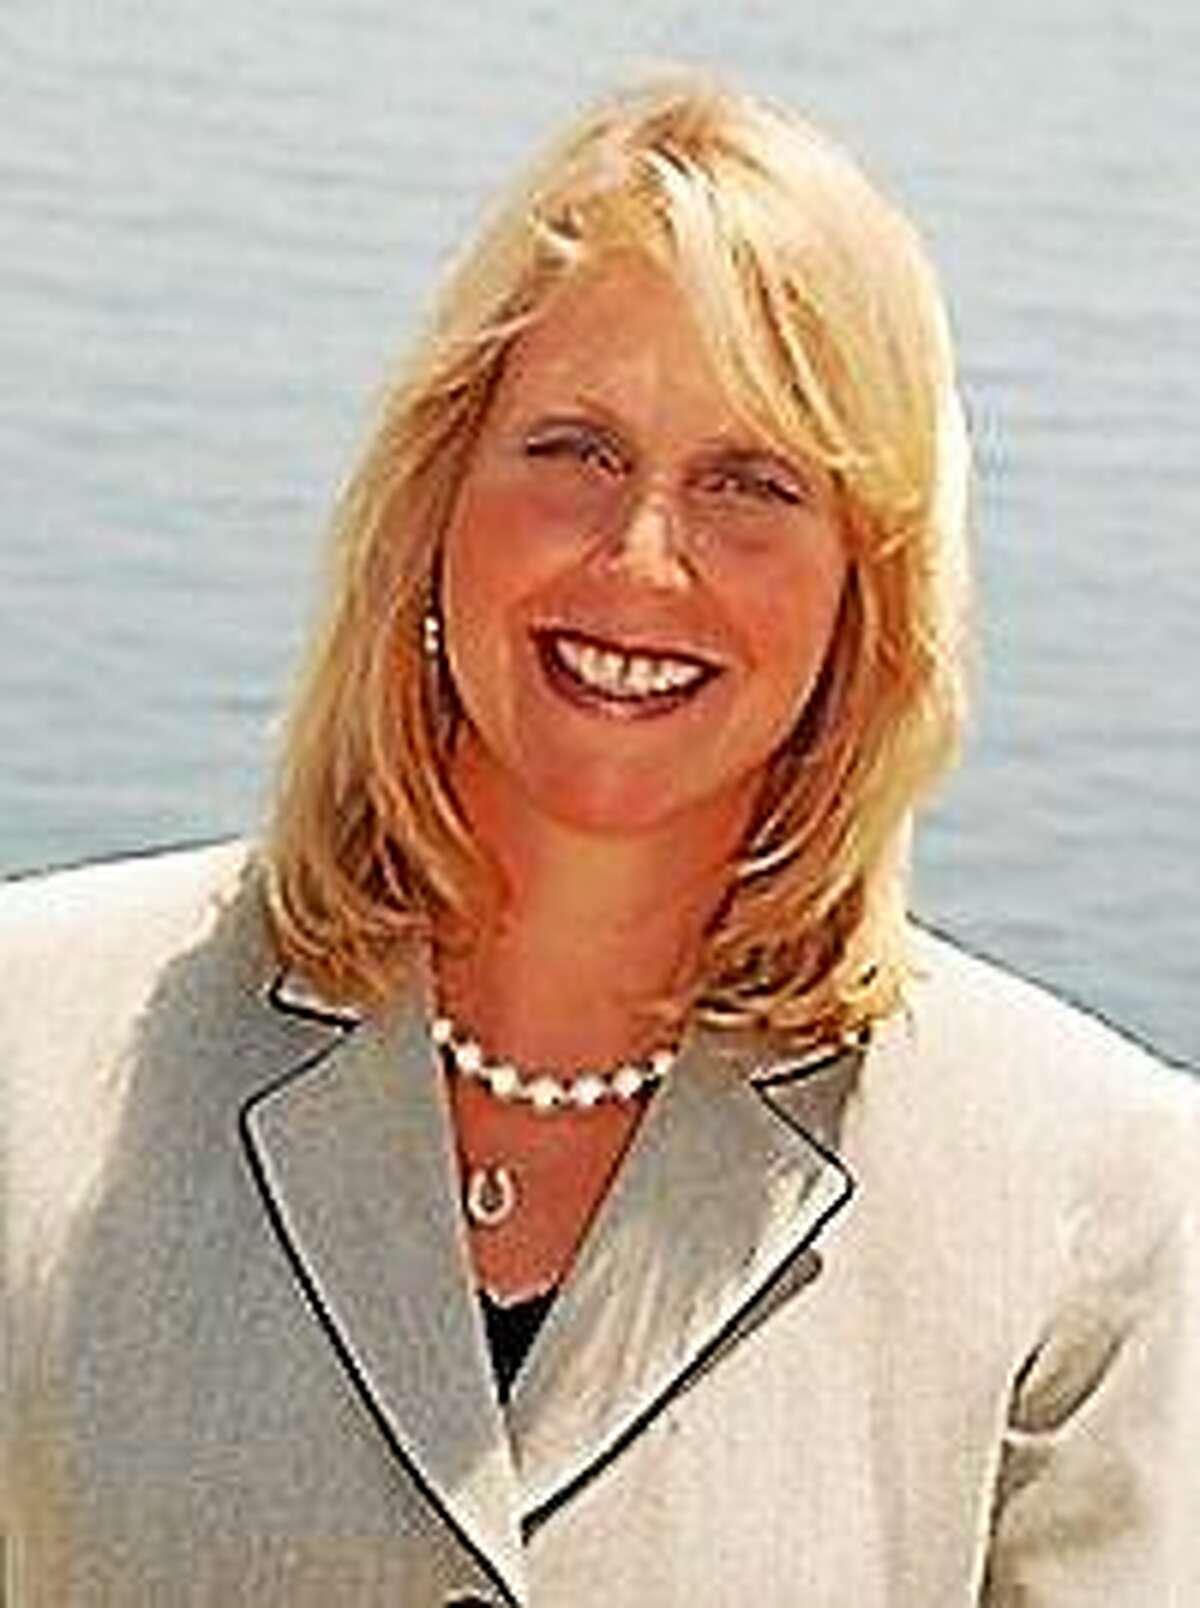 State Rep. Auden Grogins